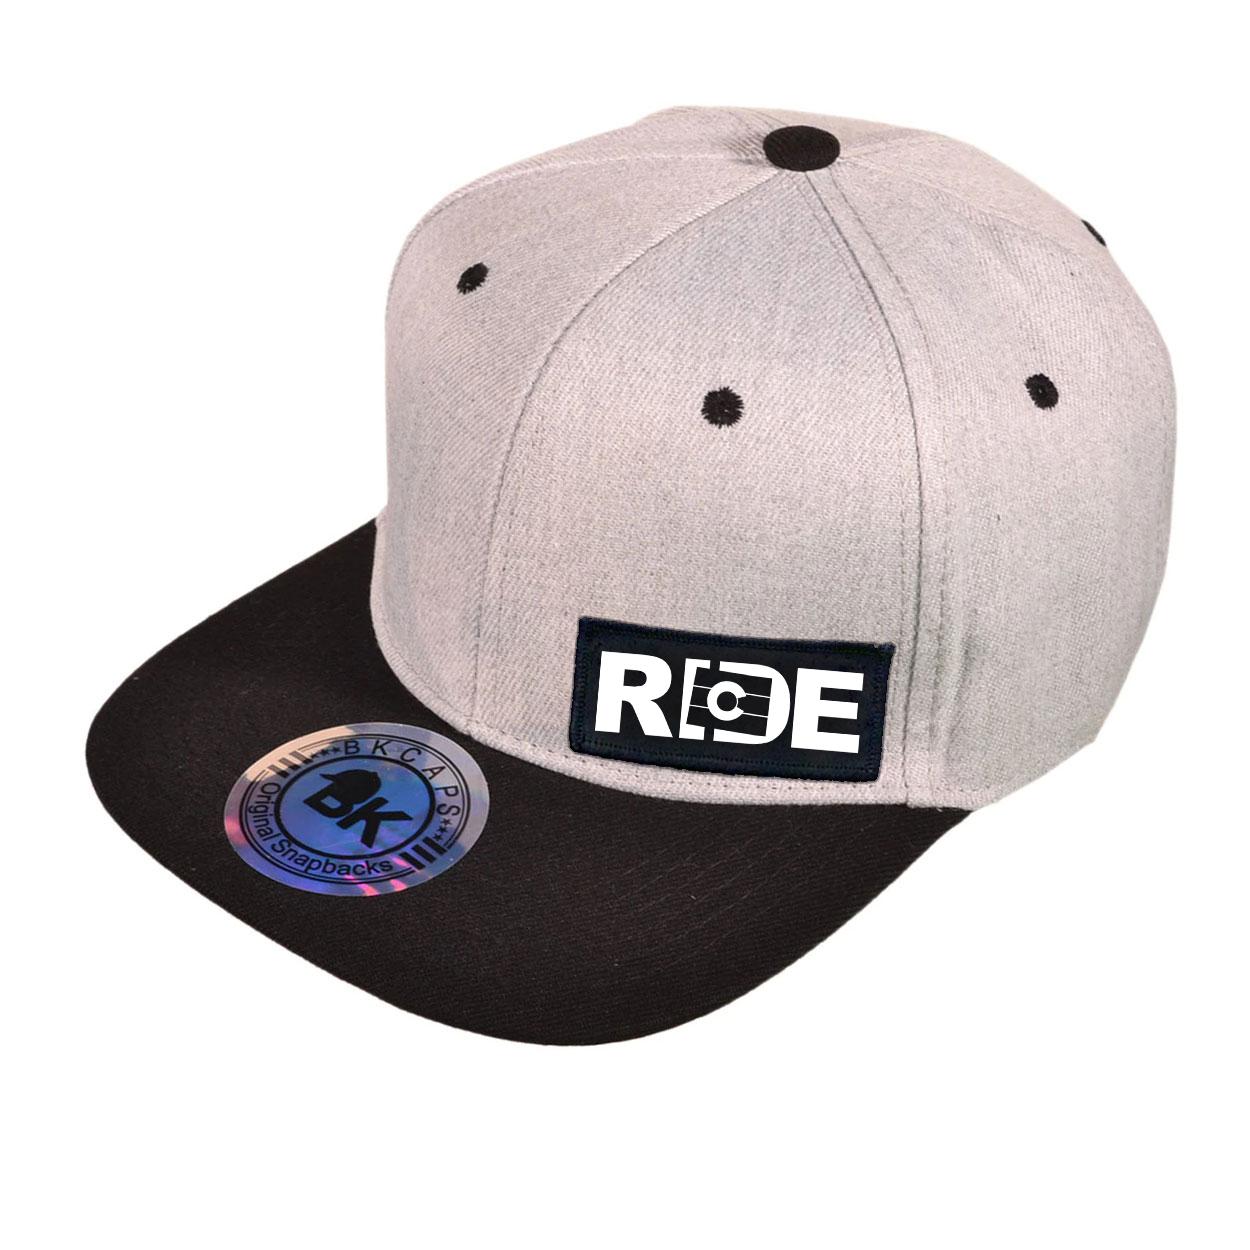 Ride Colorado Night Out Woven Patch Snapback Flat Brim Hat Heather Gray/Black (White Logo)